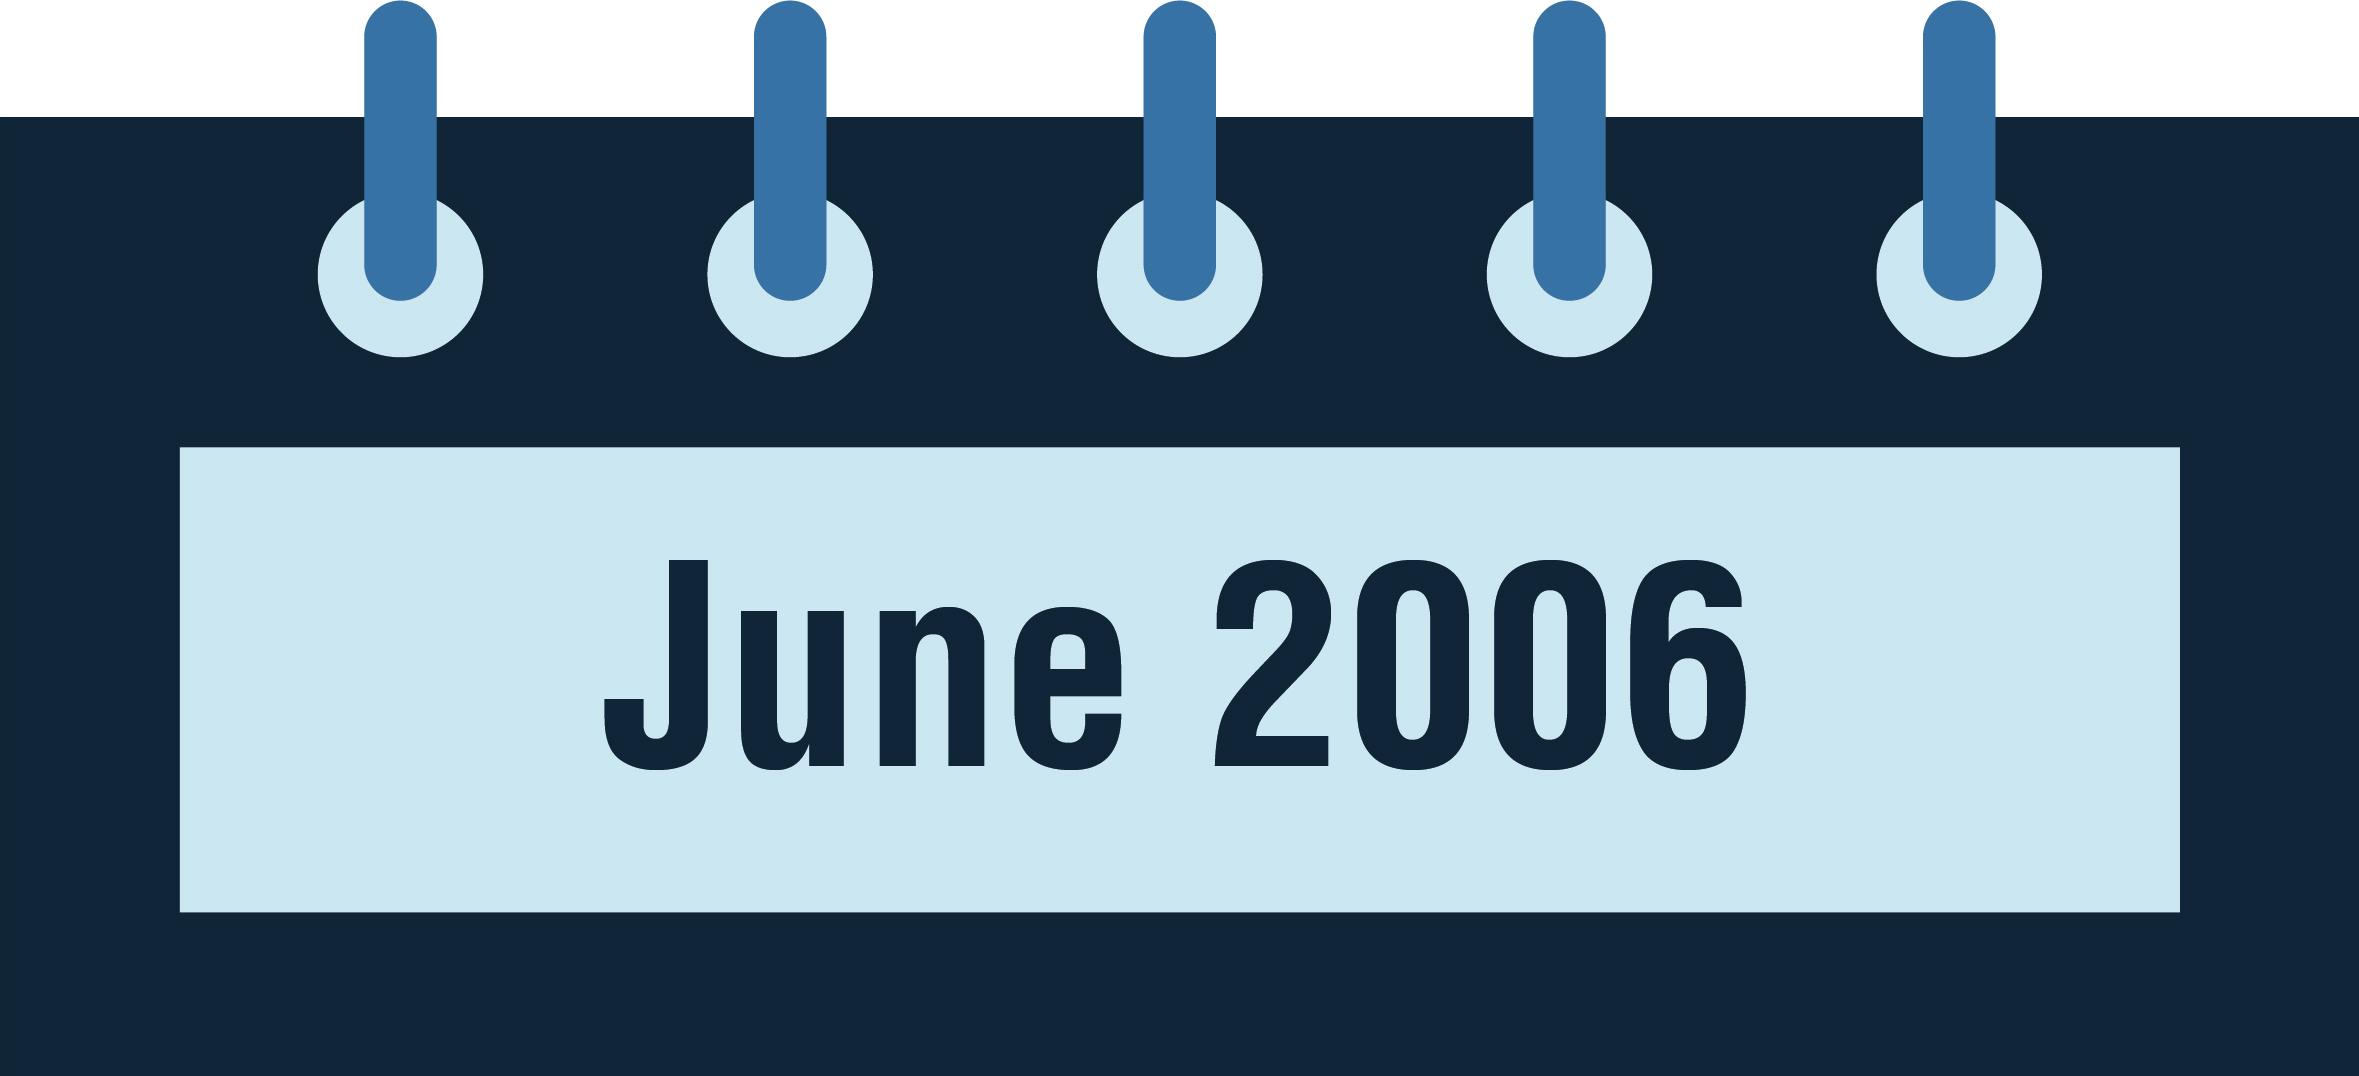 NeuroCheck History - June 2006 (Image © NeuroCheck)